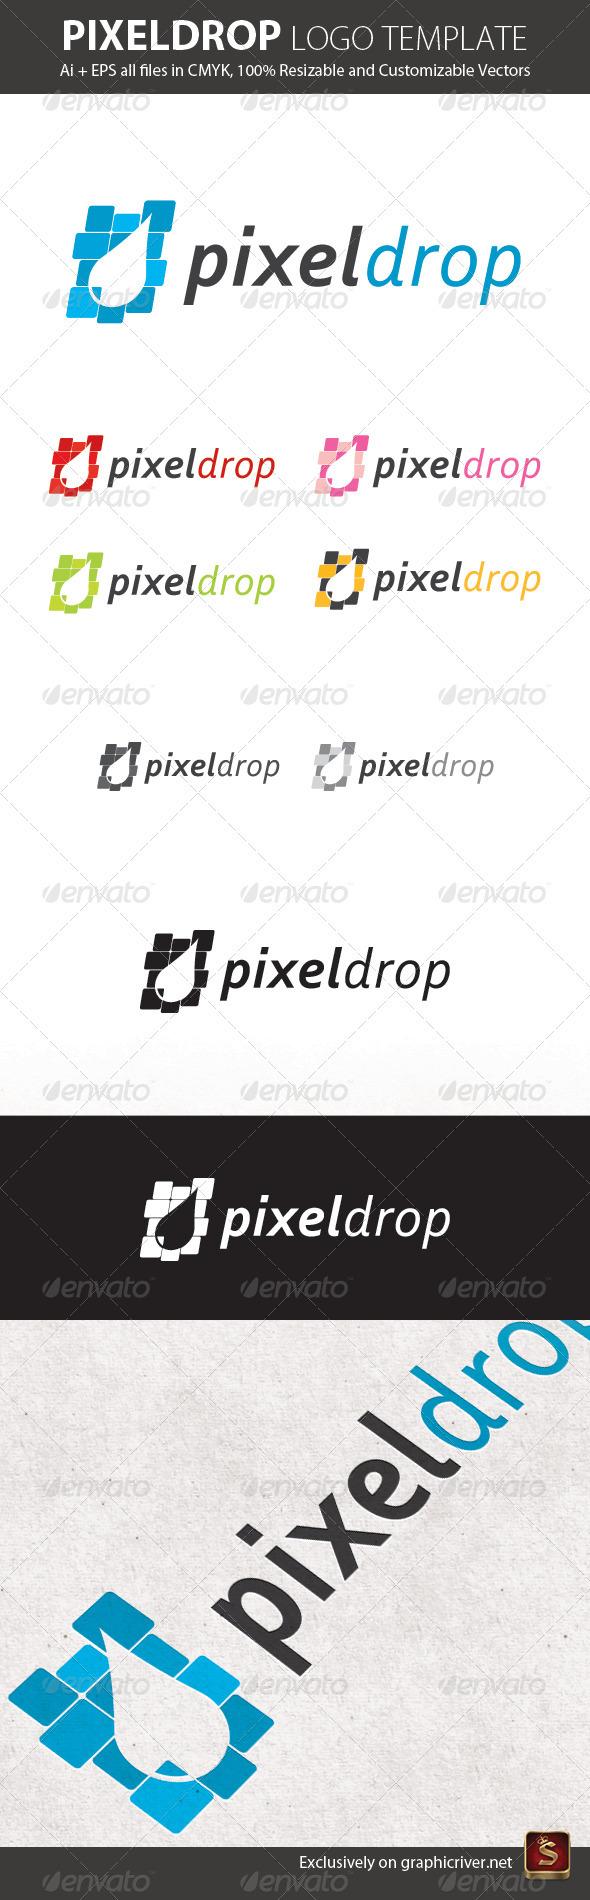 Pixel Drop Logo Template - Vector Abstract